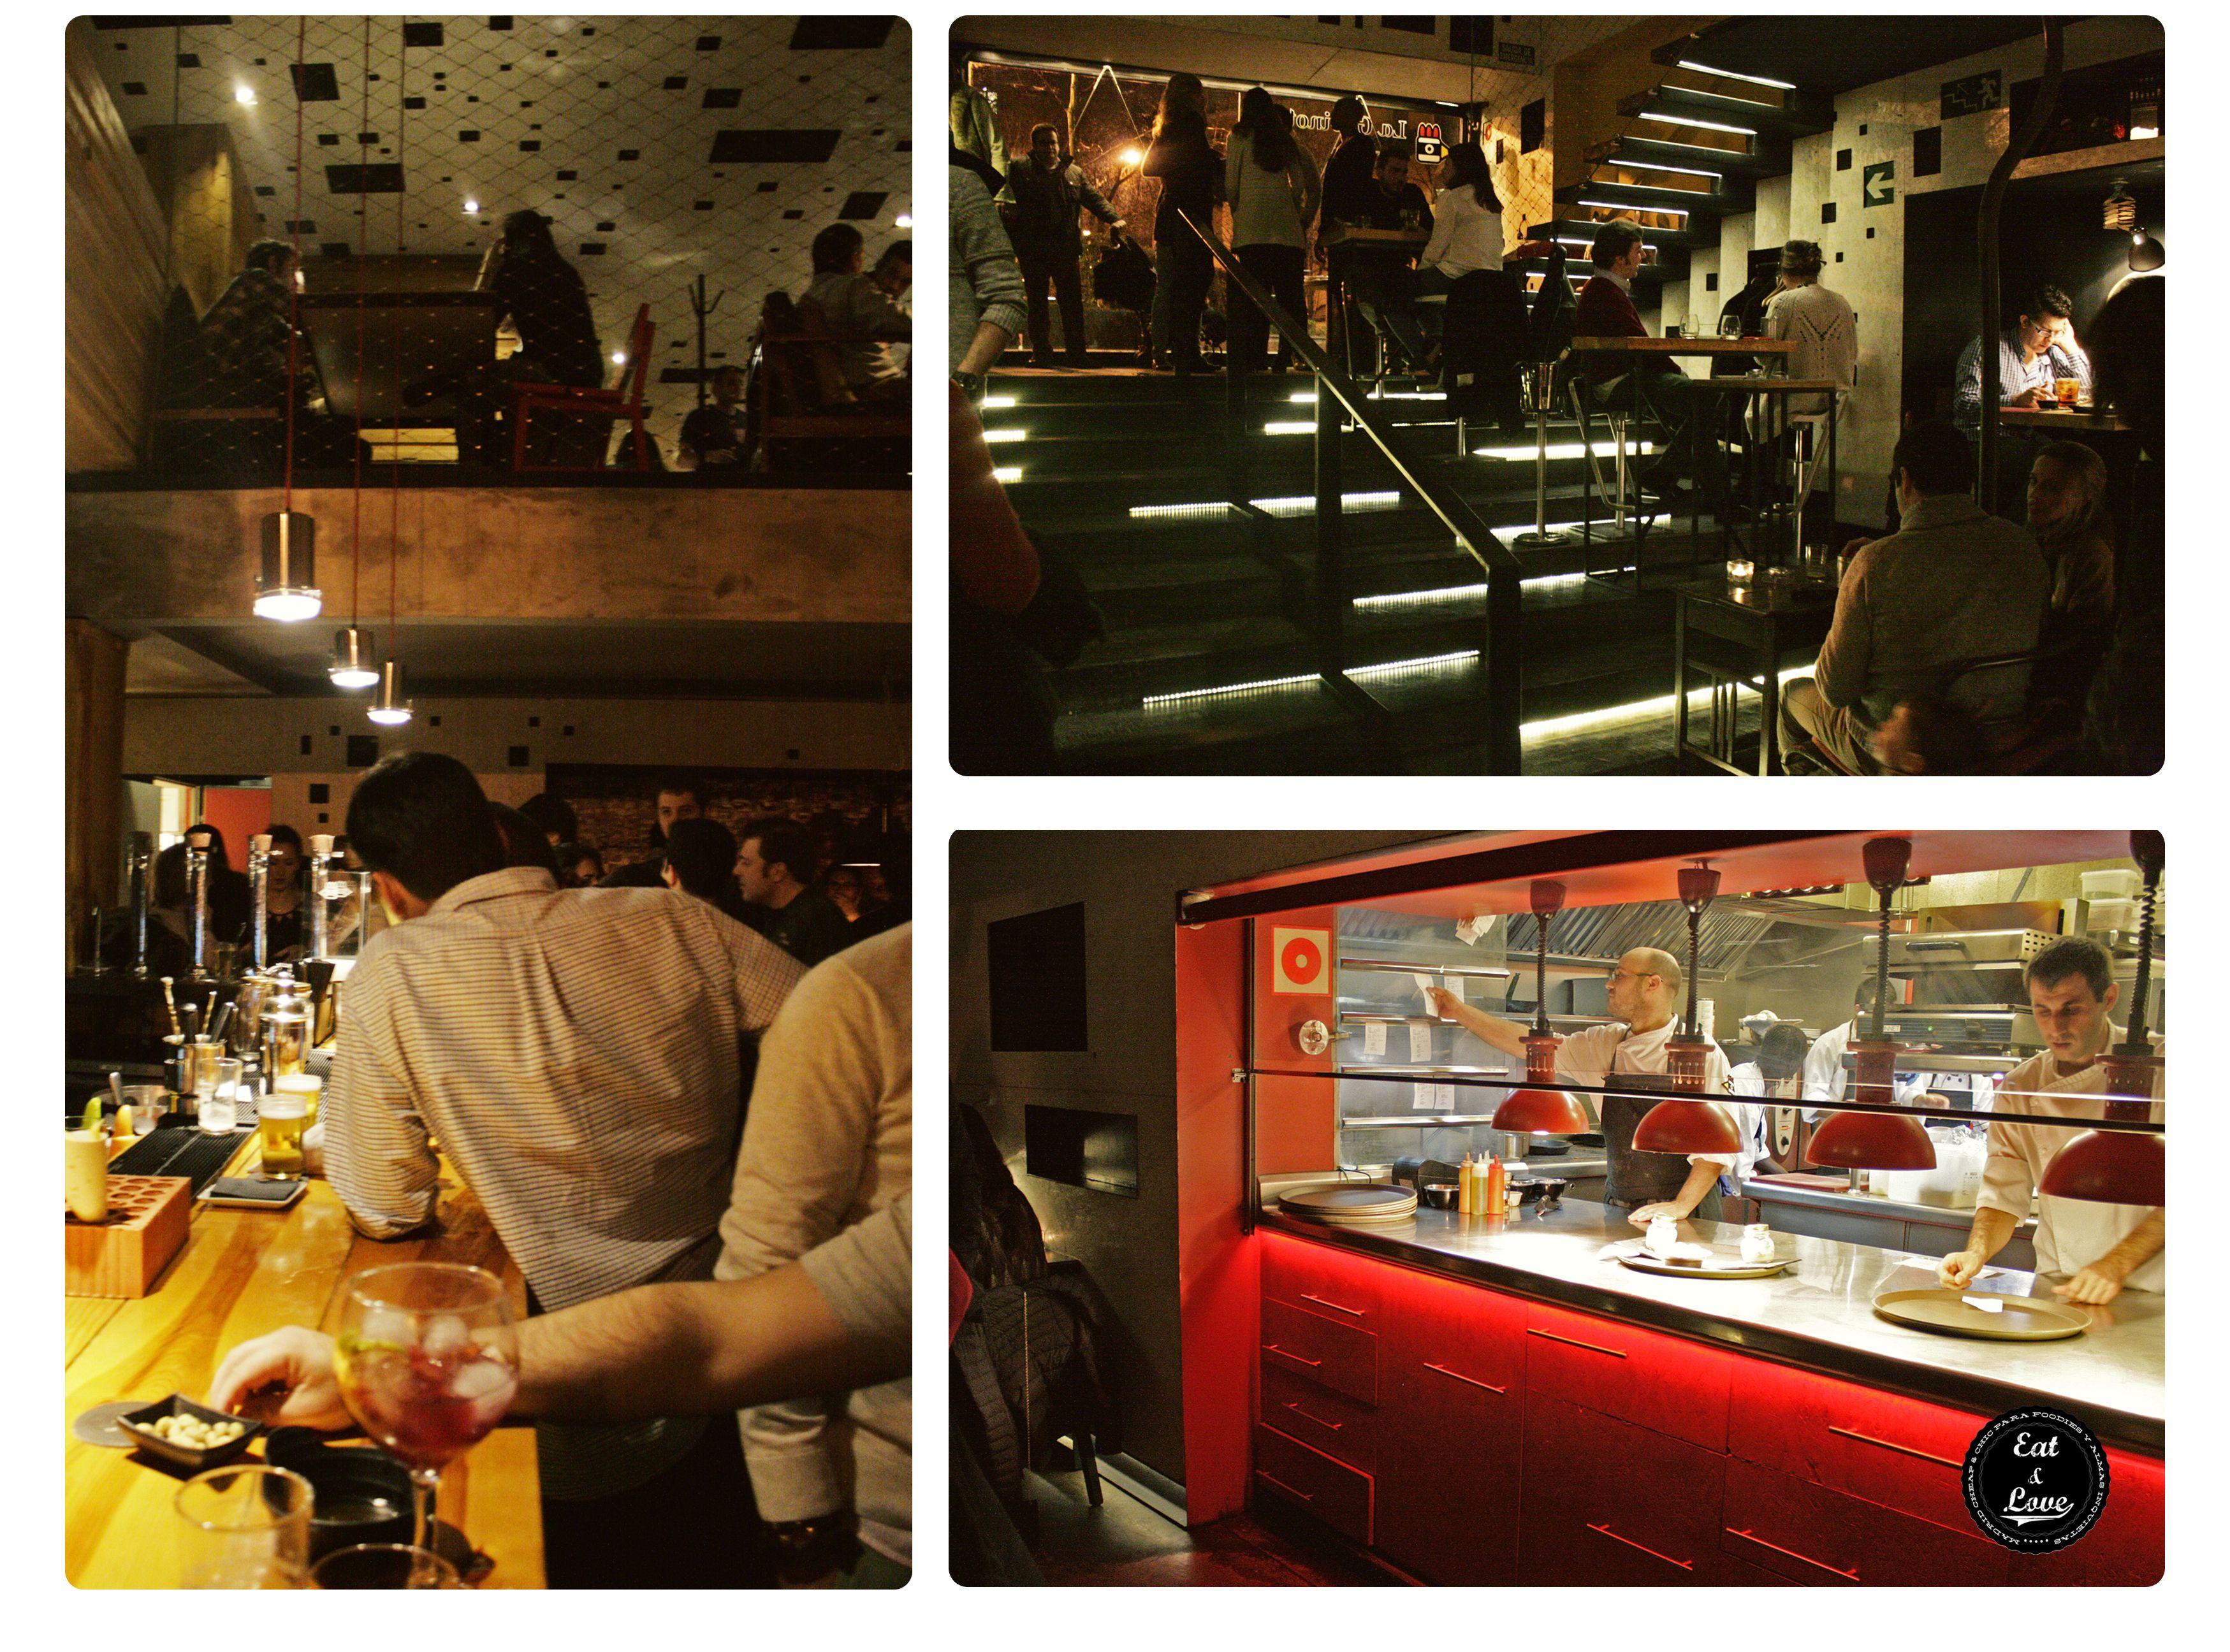 Gabinoteca restaurante creativo tapas Madrid